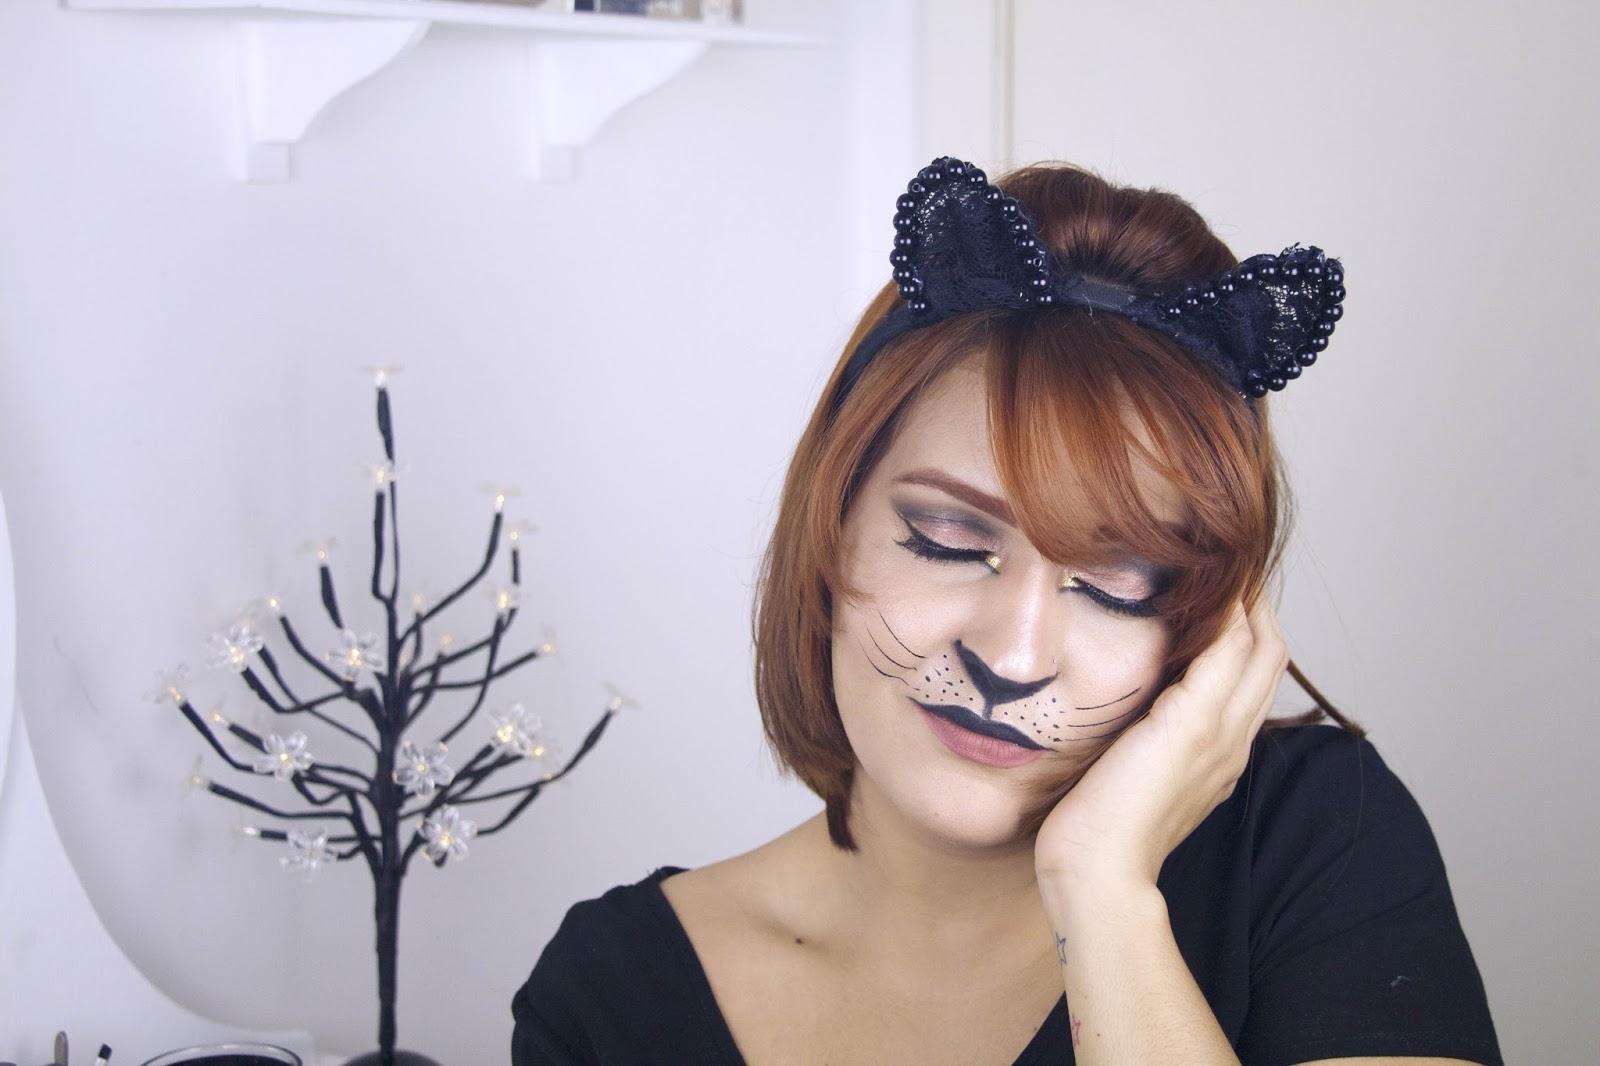 Carnaval 2016, carnaval, make up, maquiagem, maquiagem para o carnaval, maquiagem de gatinho, make up cat, tutorial, diy , diy tiara de gatinho, diy tiara cat, cat